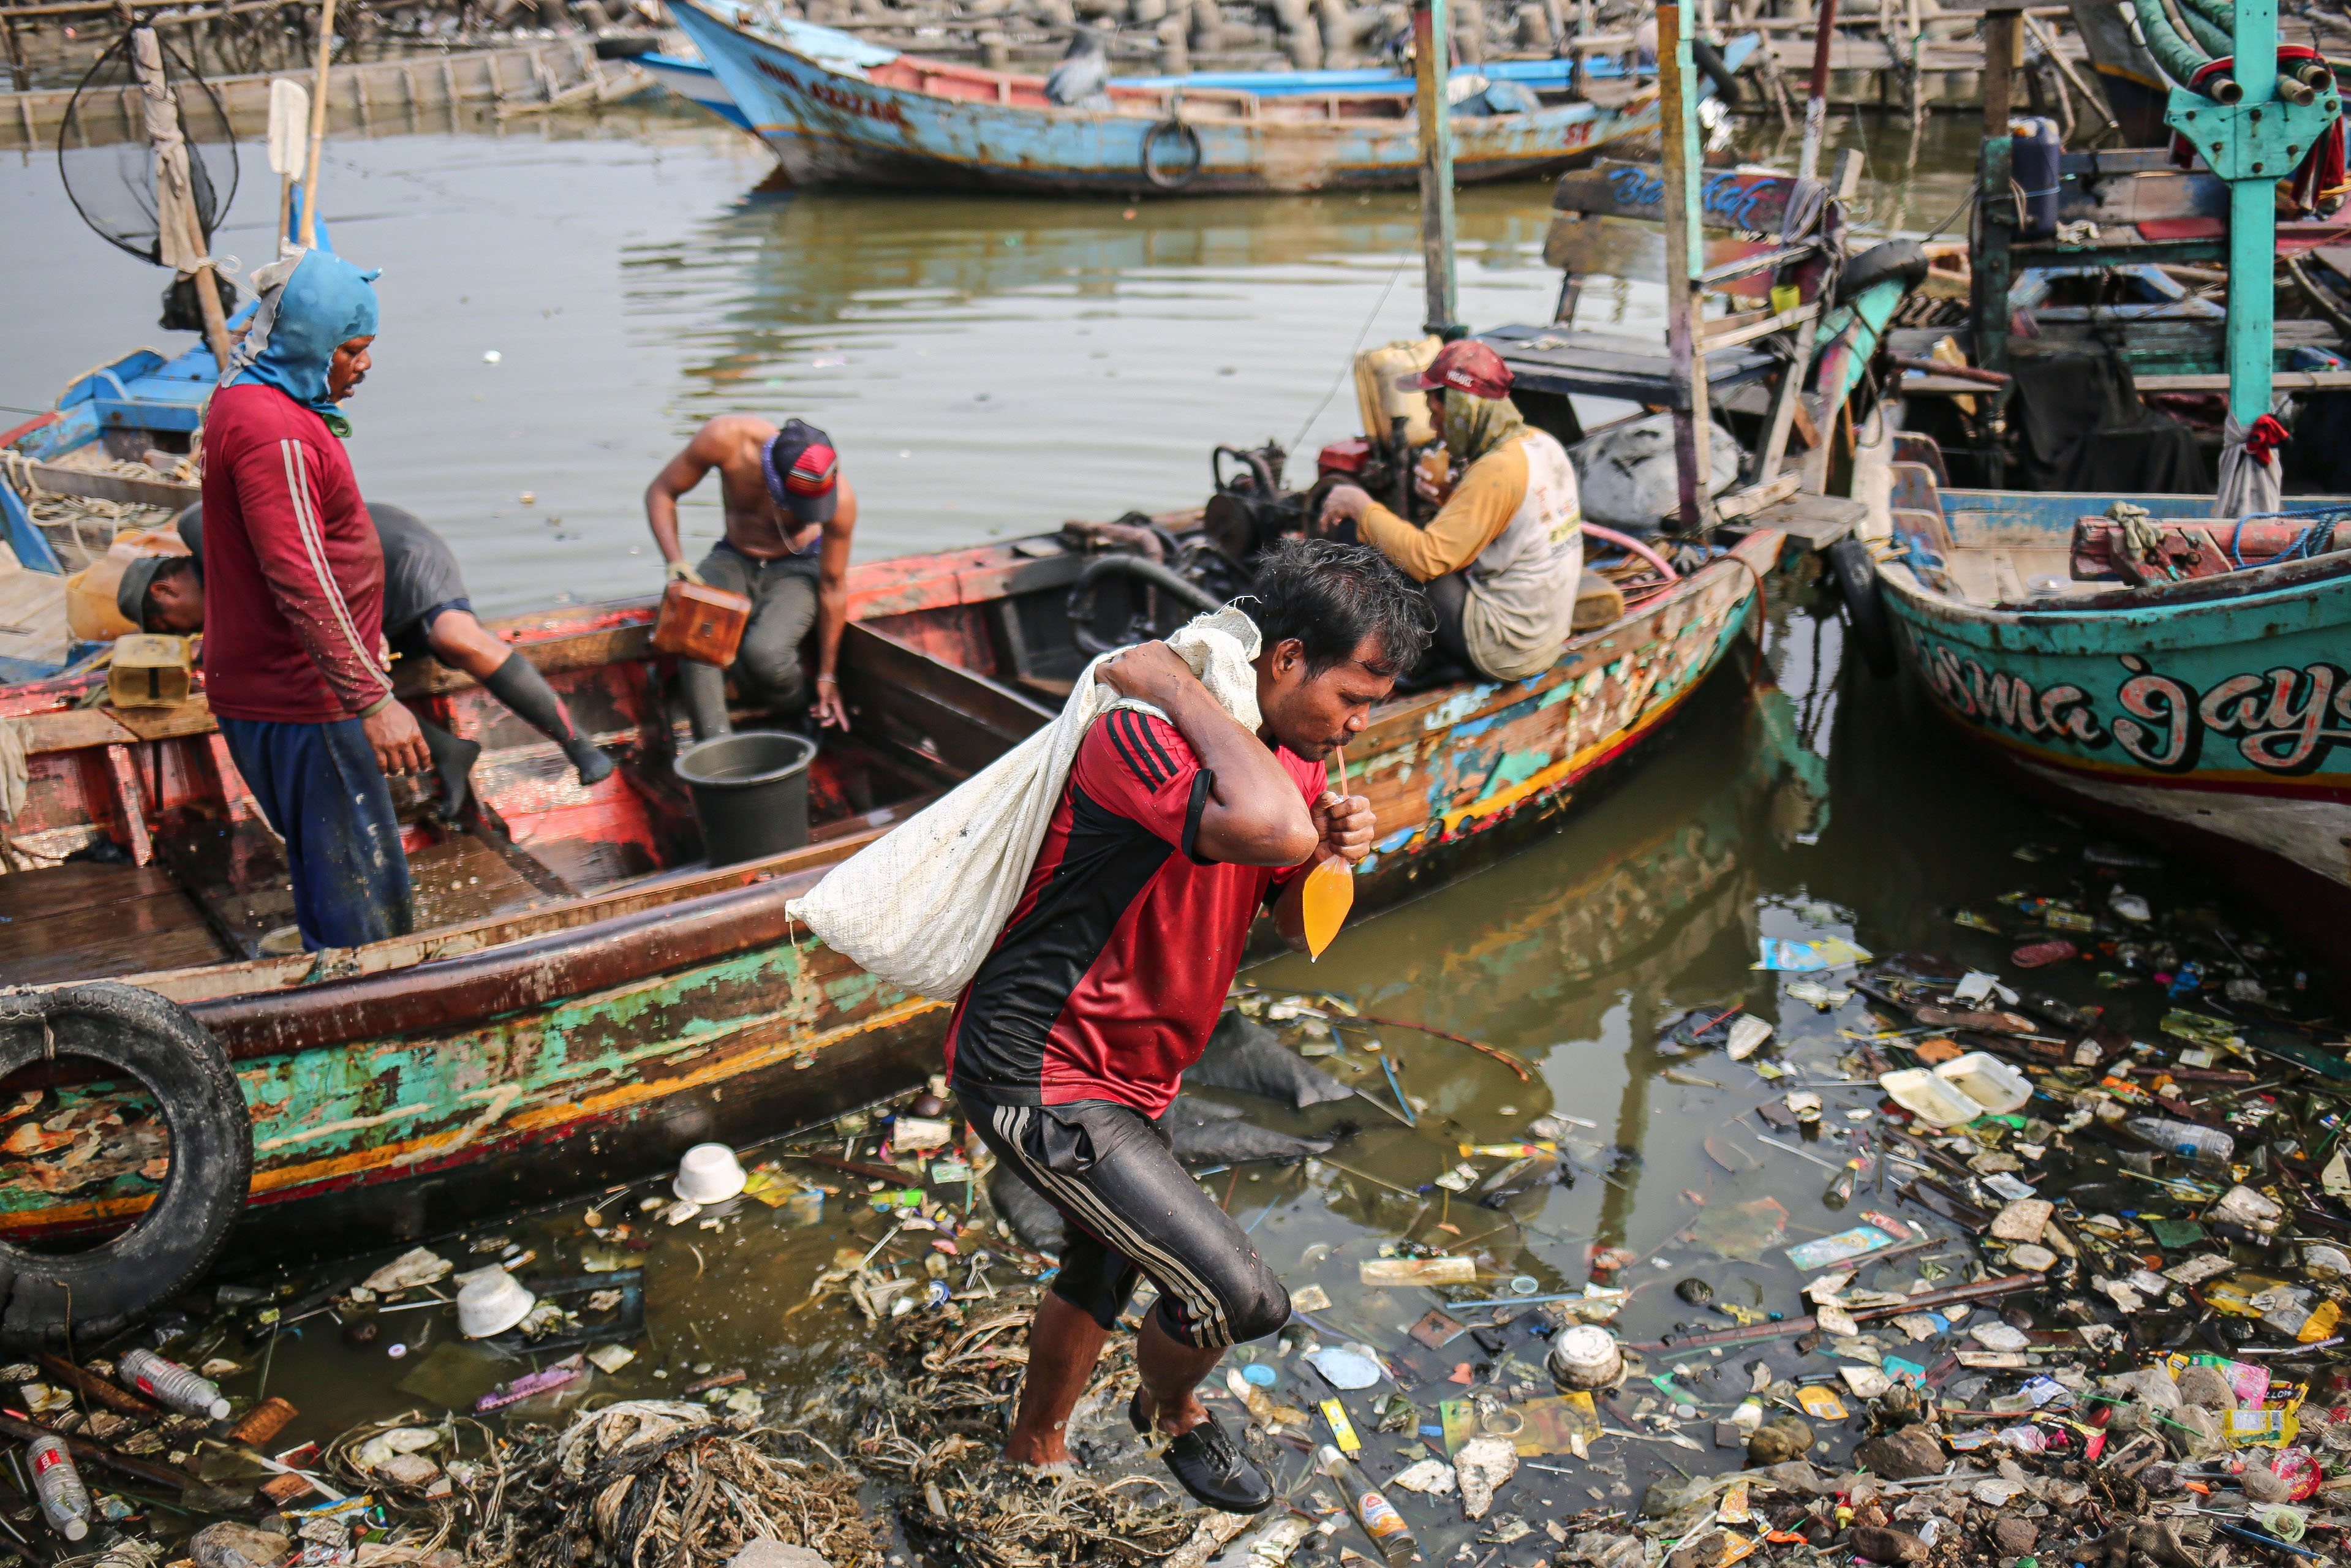 Para nelayan beraktivitas di Kampung Nelayan, Jakarta Utara, Minggu (9/8/2020). Kesatuan Nelayan Tradisional Indonesia (KNTI) mengklaim penurunan penjualan tangkapan nelayan mencapai 21 persen dan pendapatan hingga 90 persen akibat merebaknya virus covid-19.